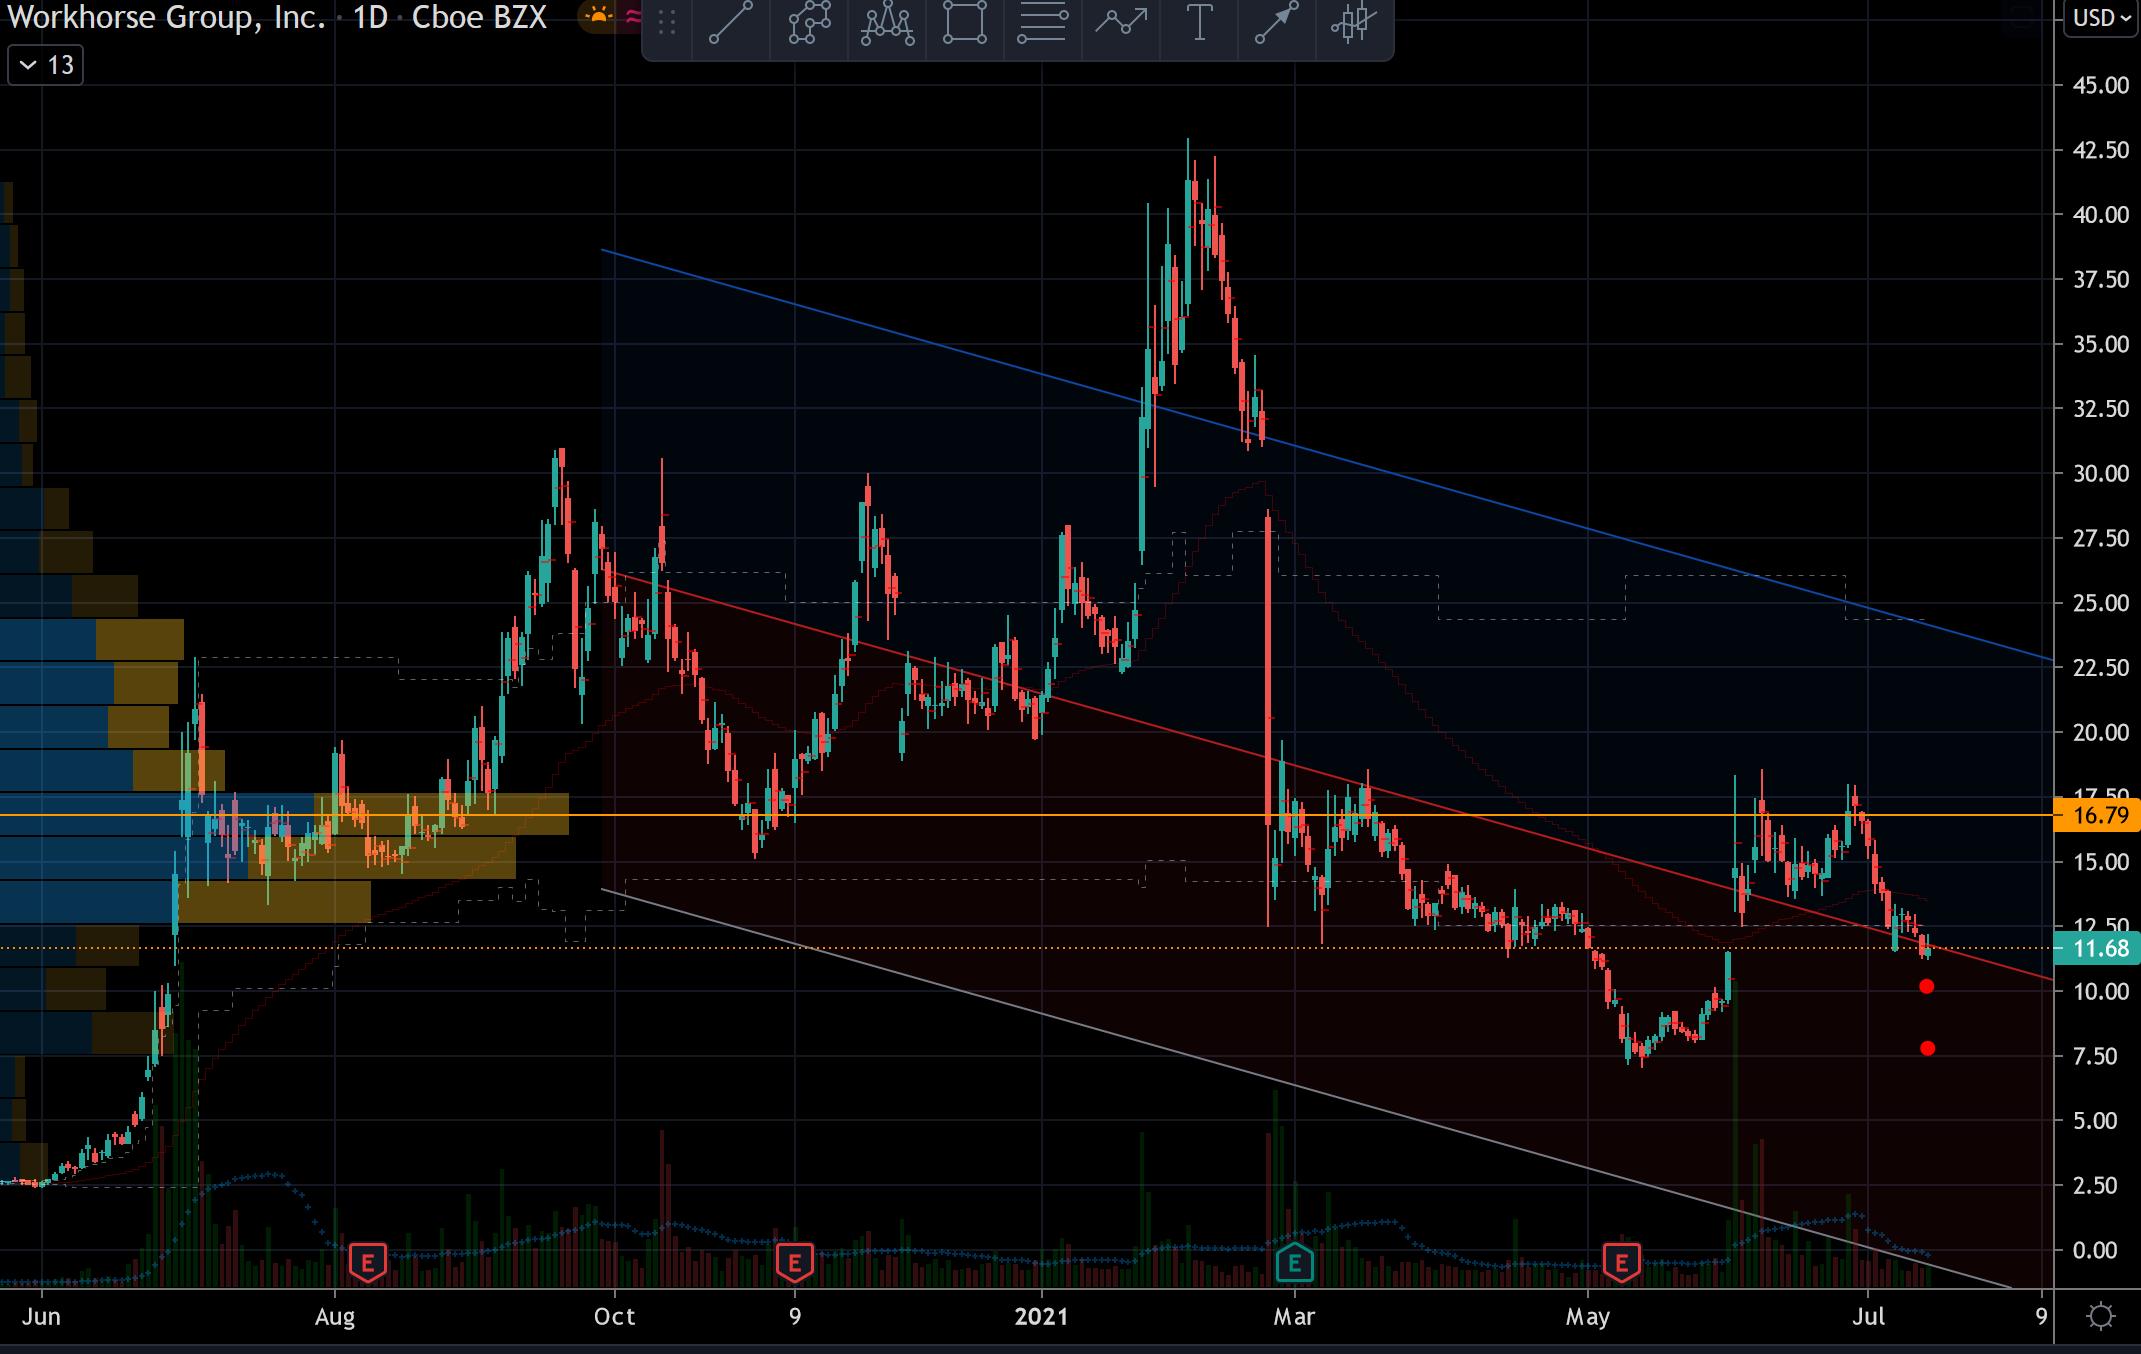 Workhorse (WKHS) Stock Chart Showing Trading Range